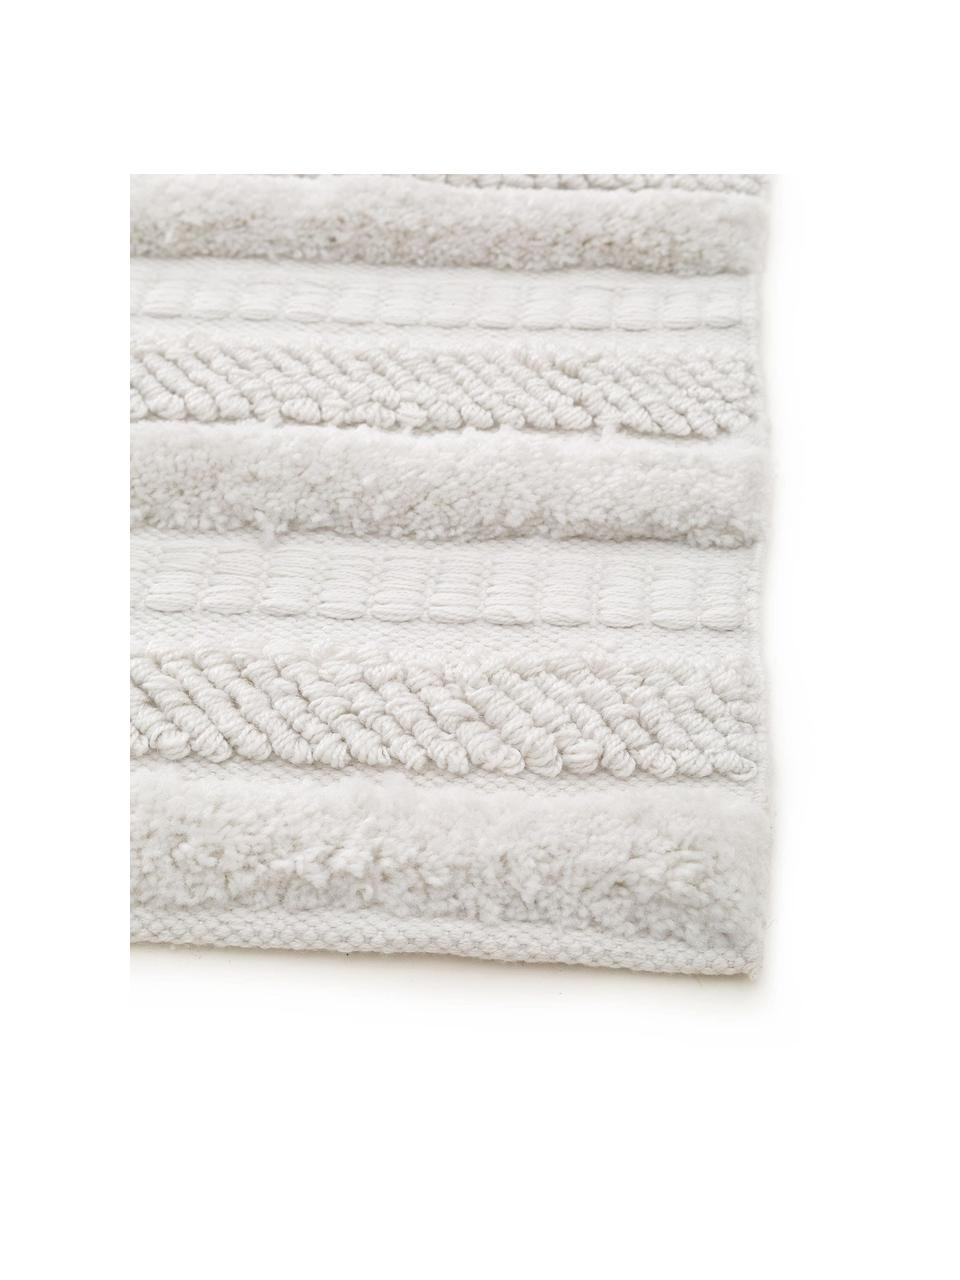 In- & outdoor vloerkleed Toni met hoog-laag structuur, 100% polyester (gerecycled PET), Ivoorkleurig, 200 x 300 cm